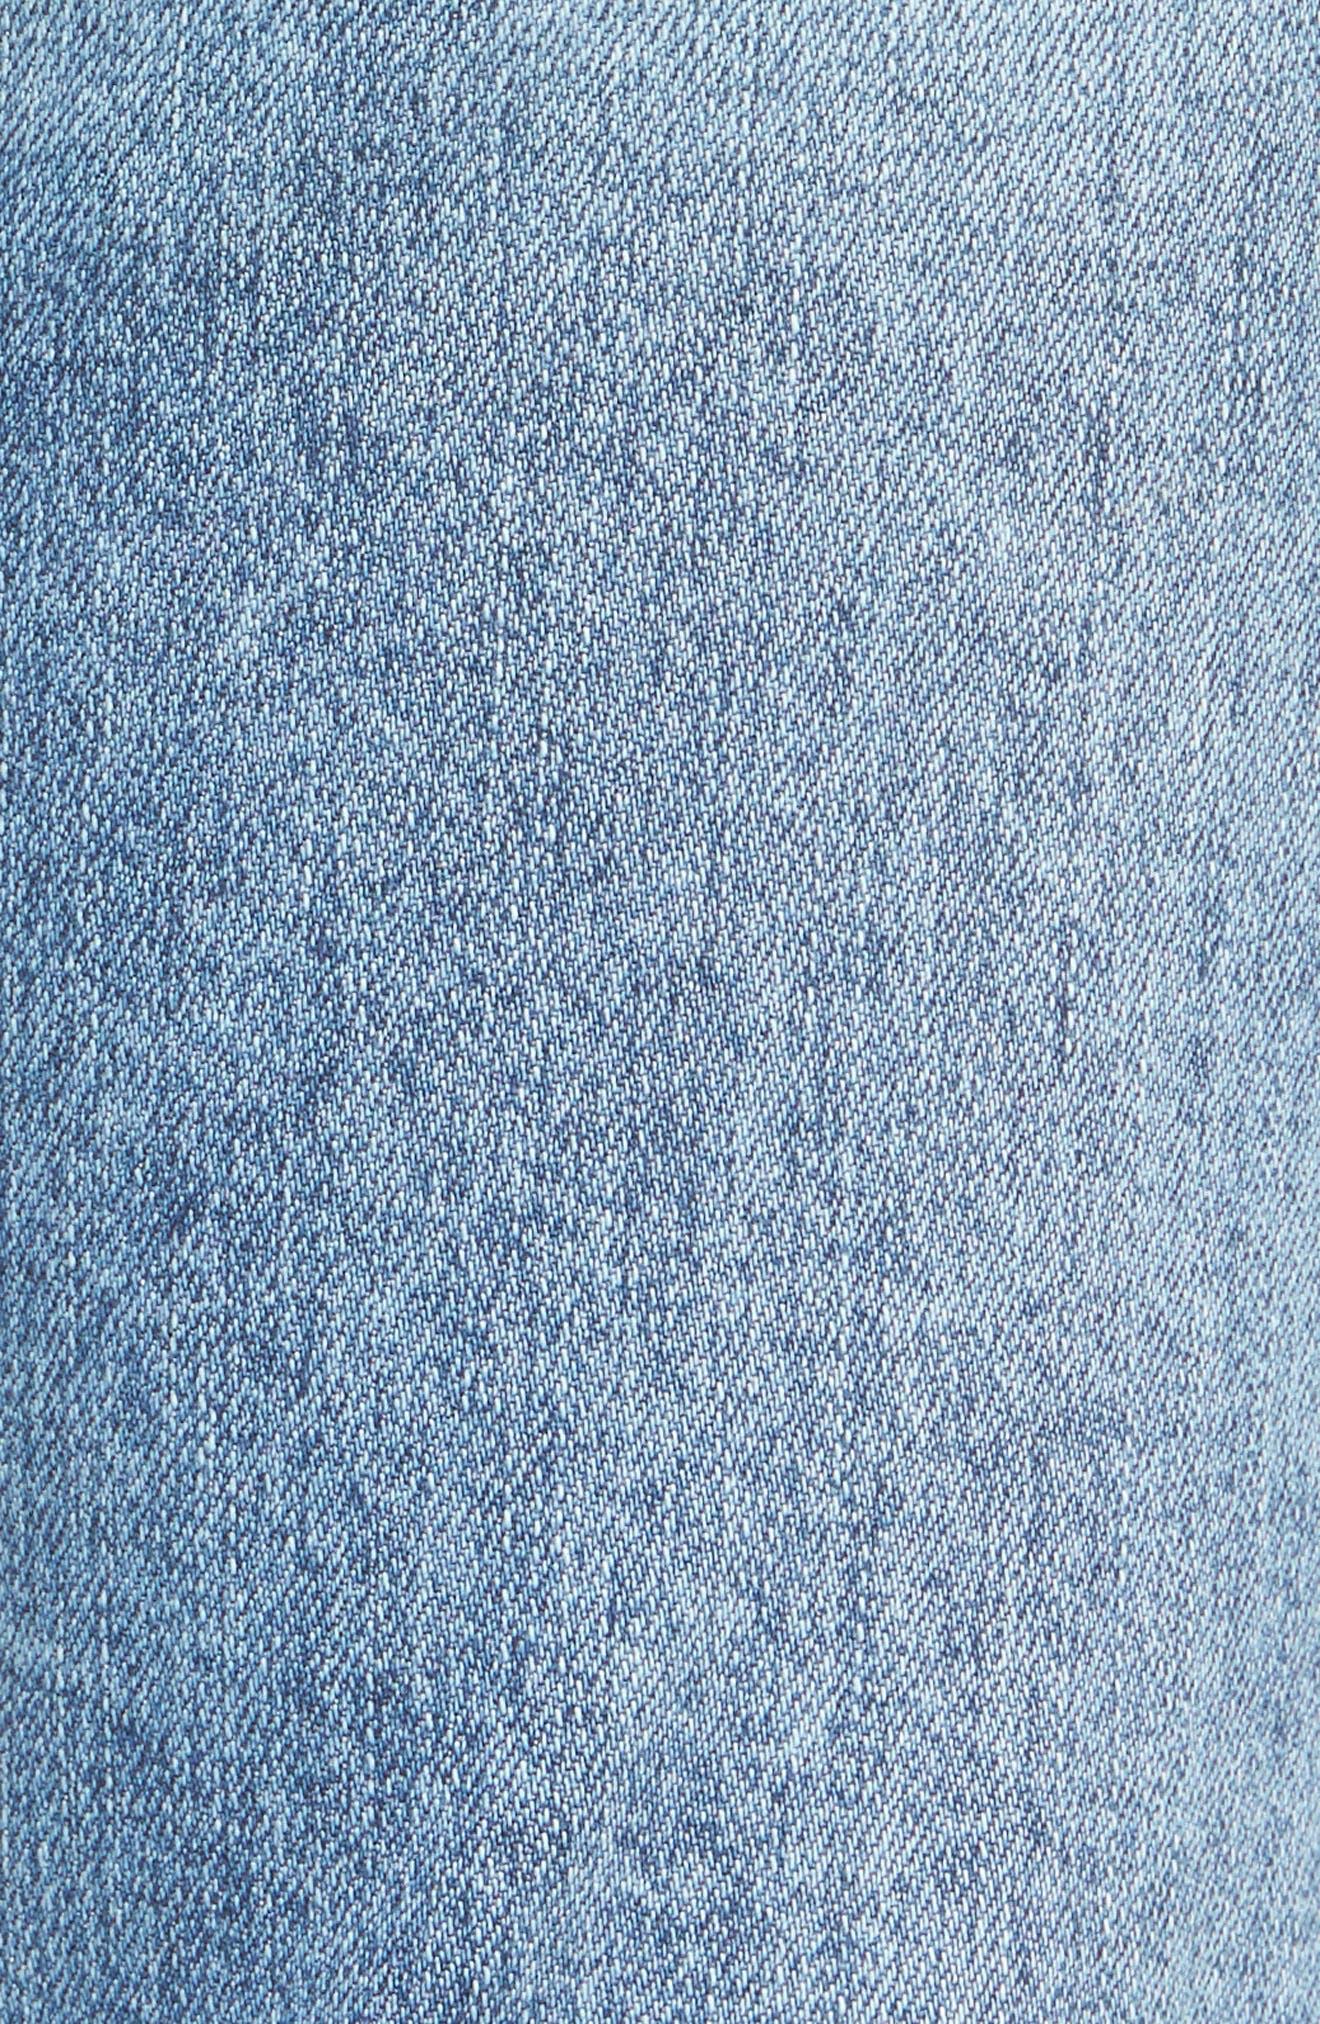 Alternate Image 5  - 7 For All Mankind® Release Hem Ankle Skinny Jeans (Rockaway Beach)